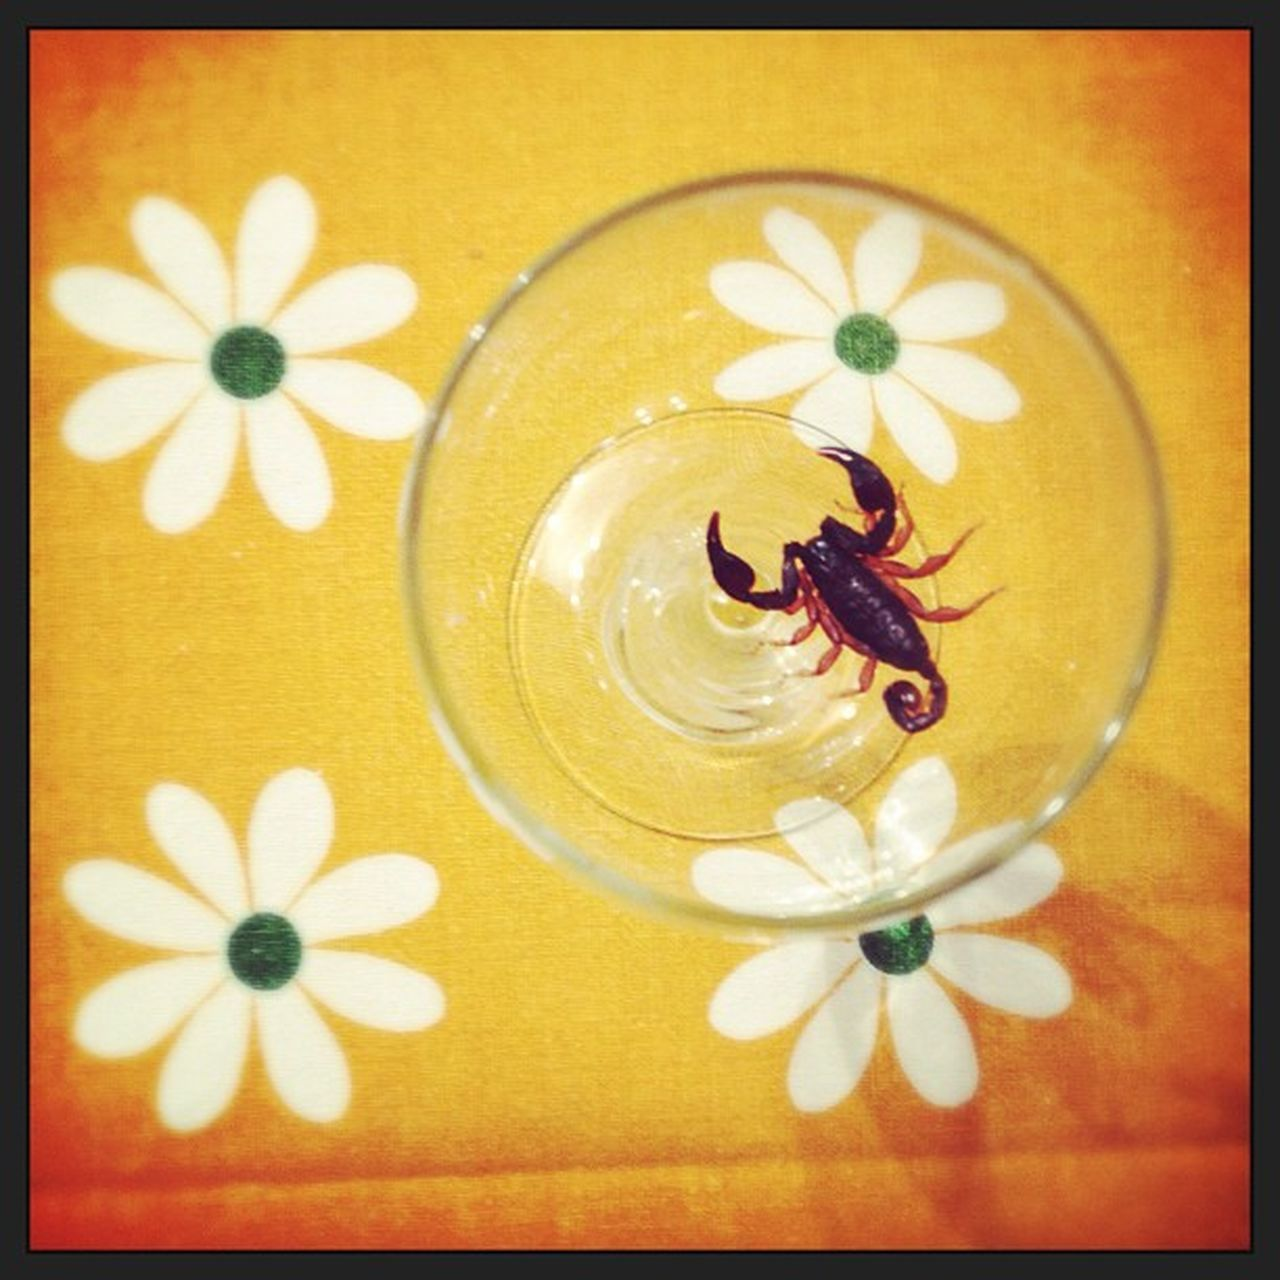 Summer Flowers Holidays Scorpion Ospitenongradito